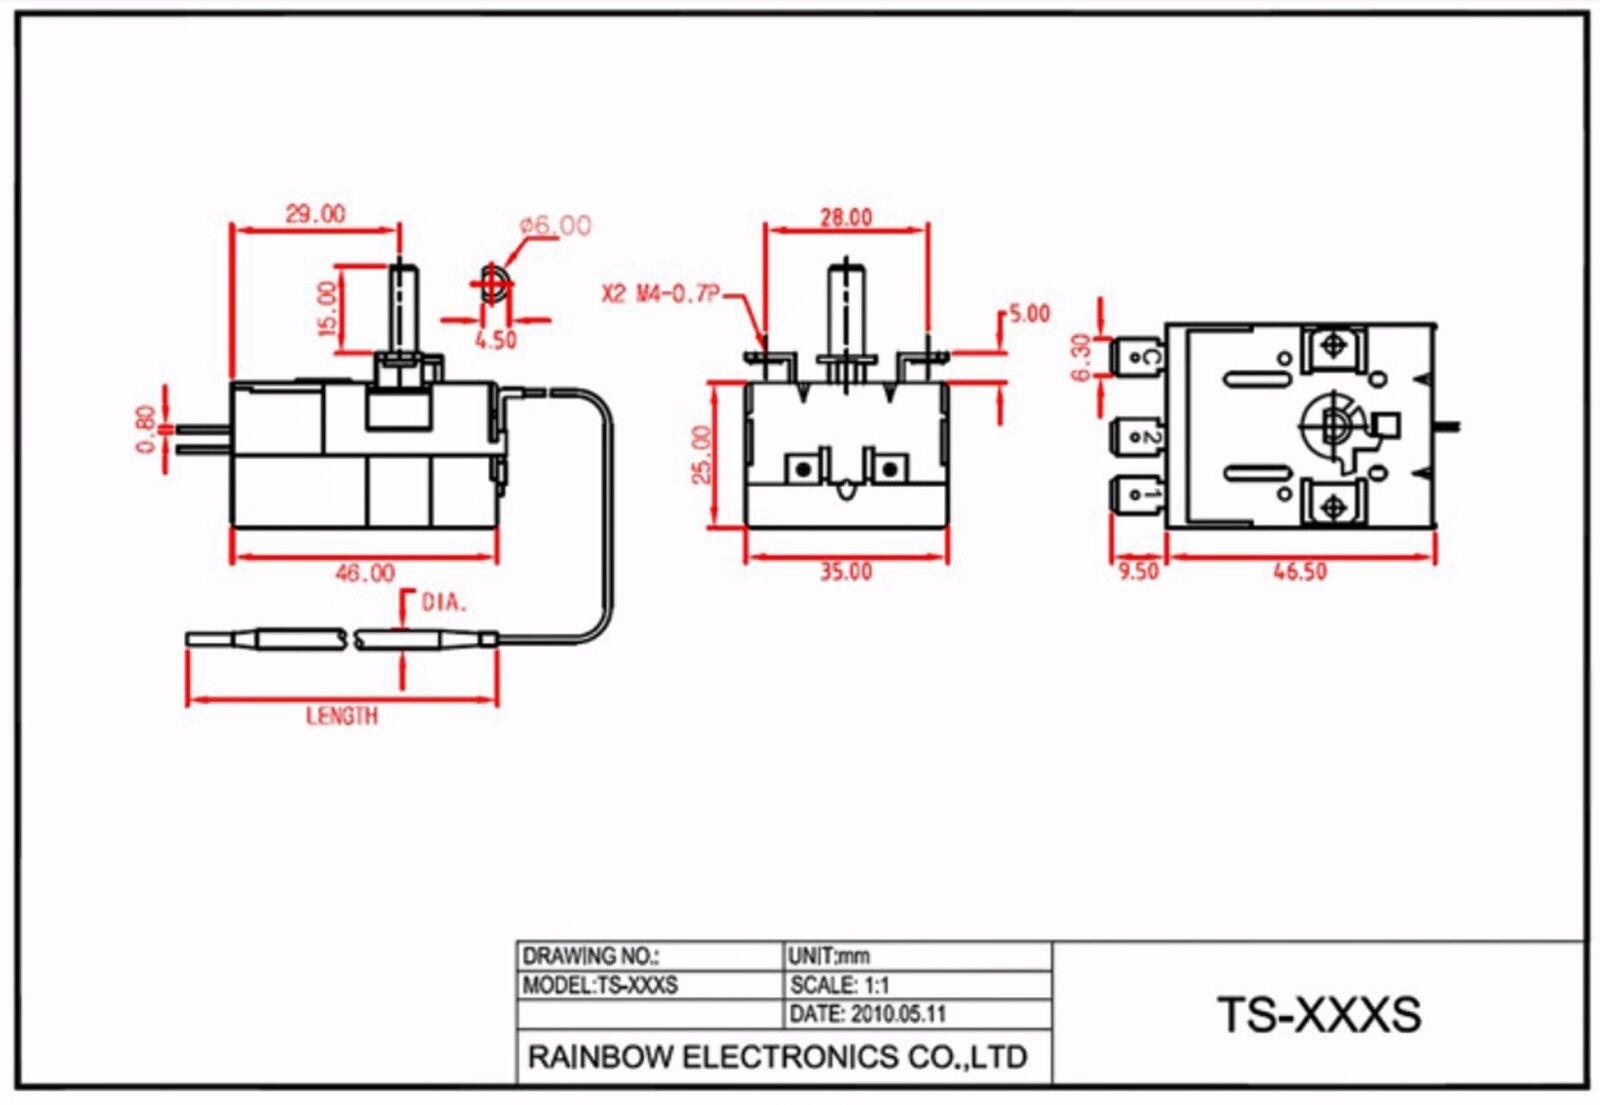 1pc Capillary Thermostat Temperature Control TS-050S 0~+50℃ 16A250VAC Rainbow